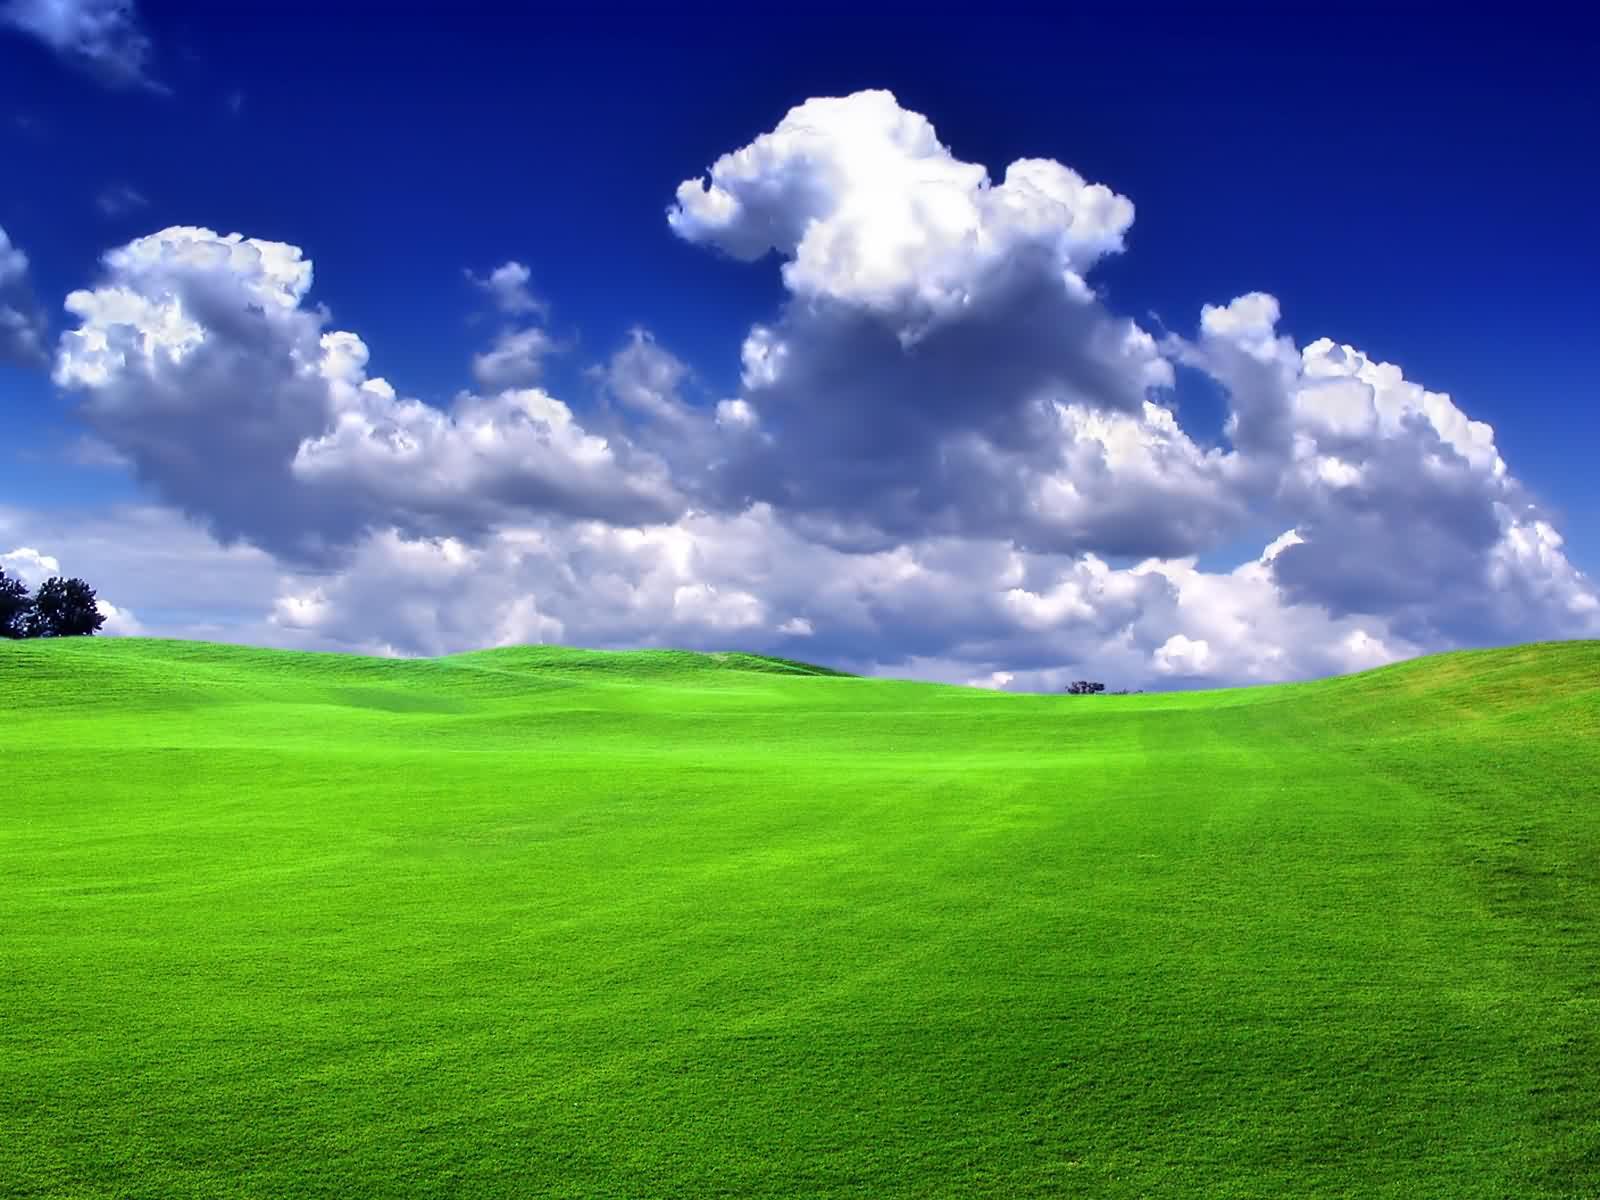 ... de pantalla fondos de pantalla hd imagenes navidad paisajes hermosos